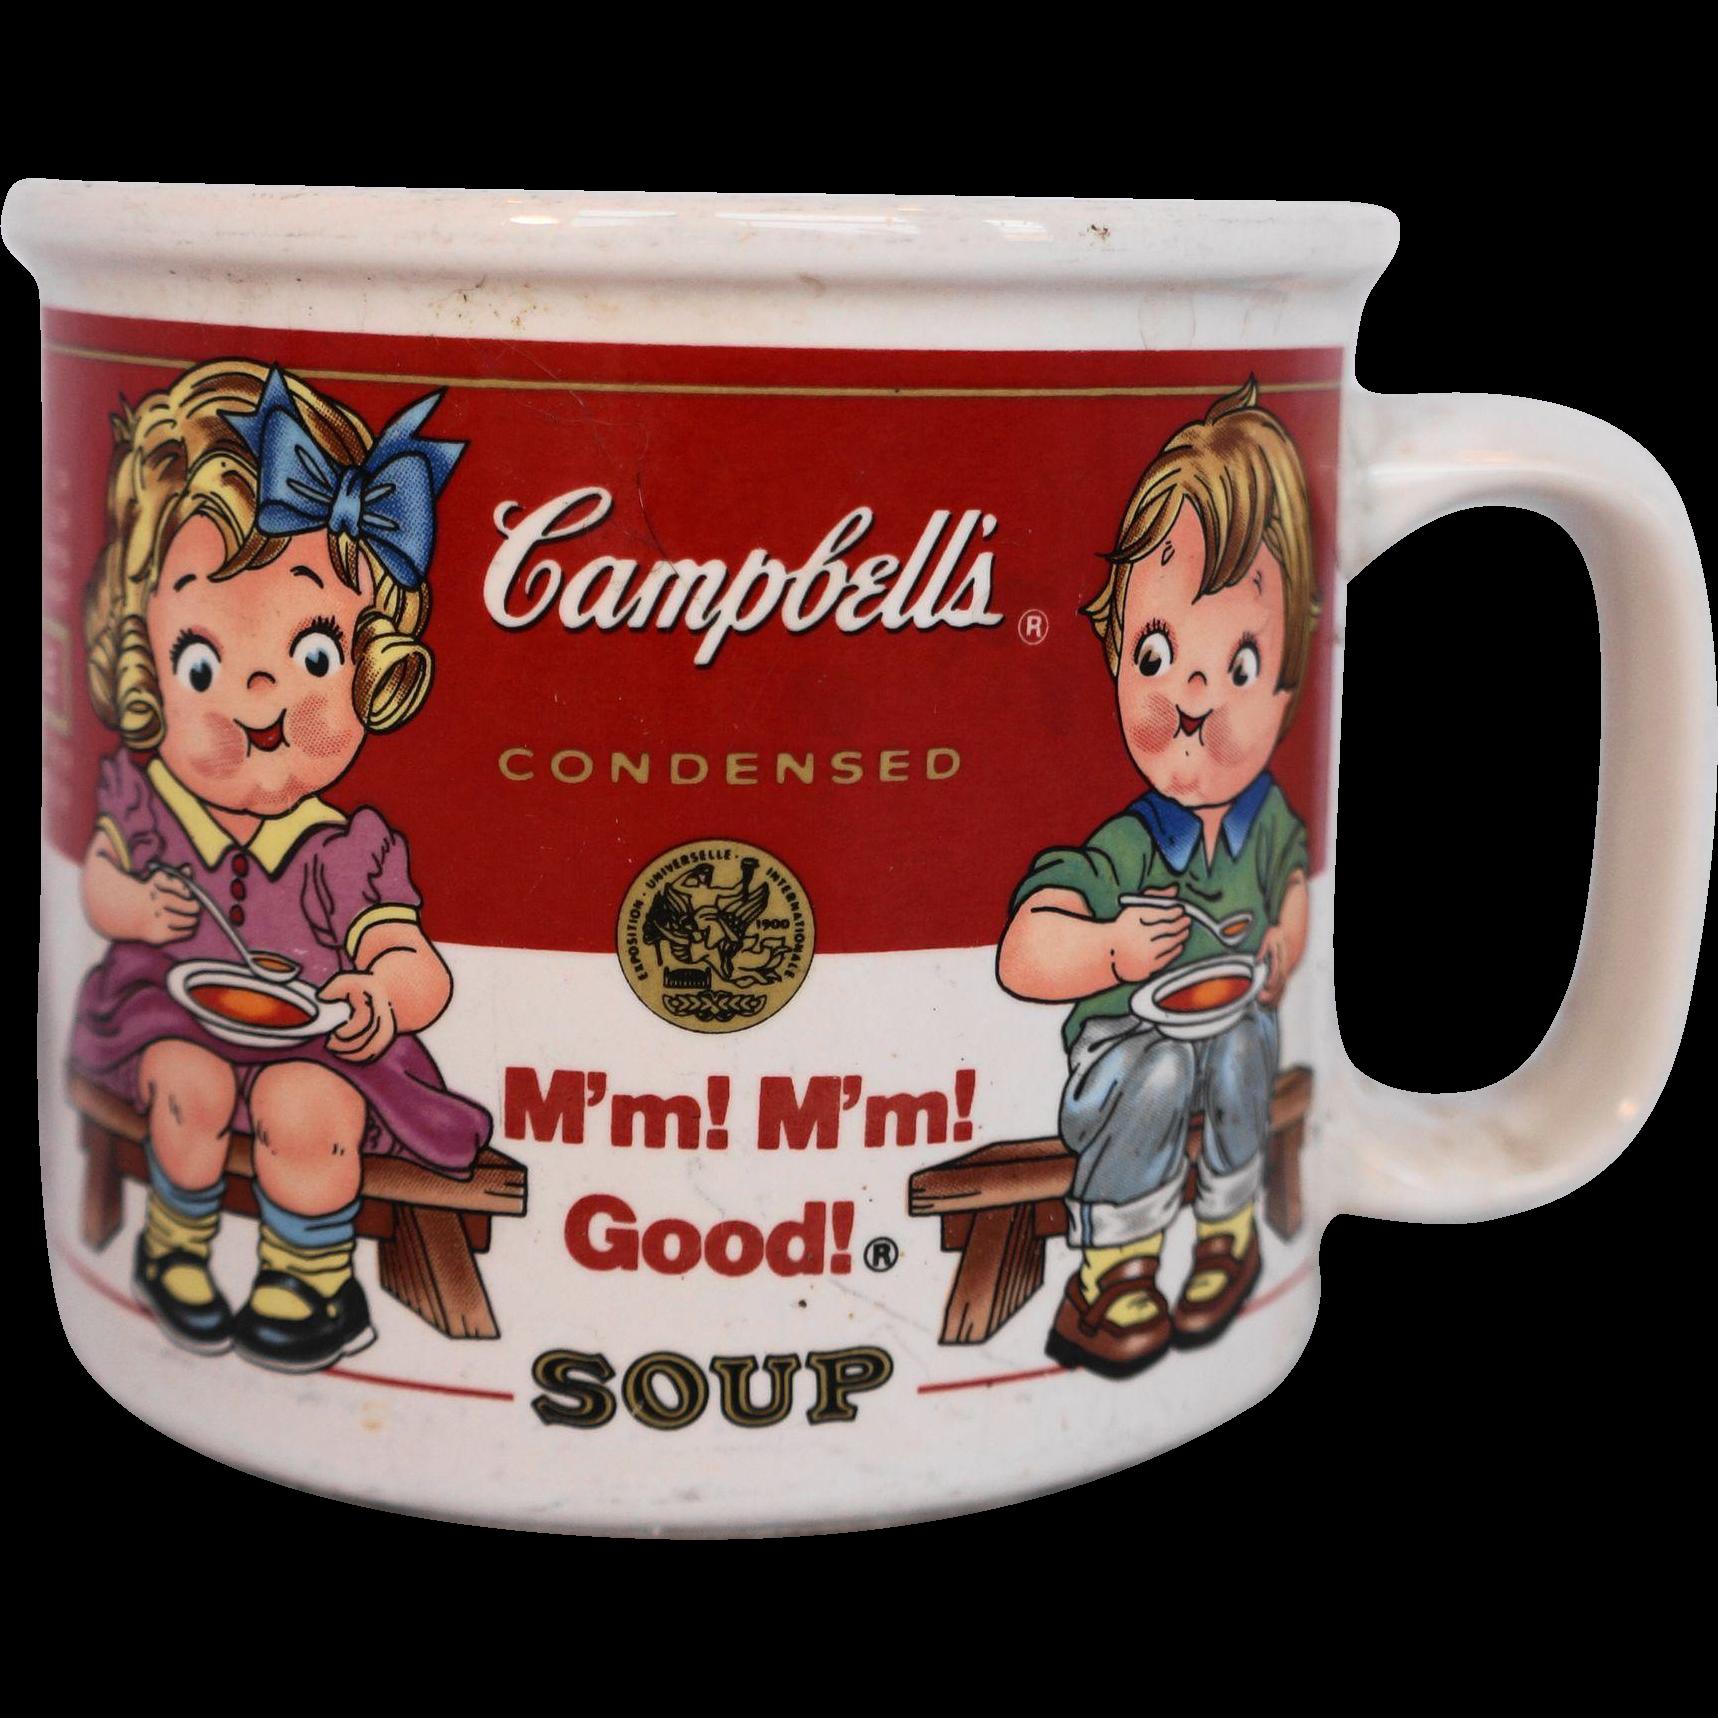 Campbells Kids M'm M'm Good Soup Mug